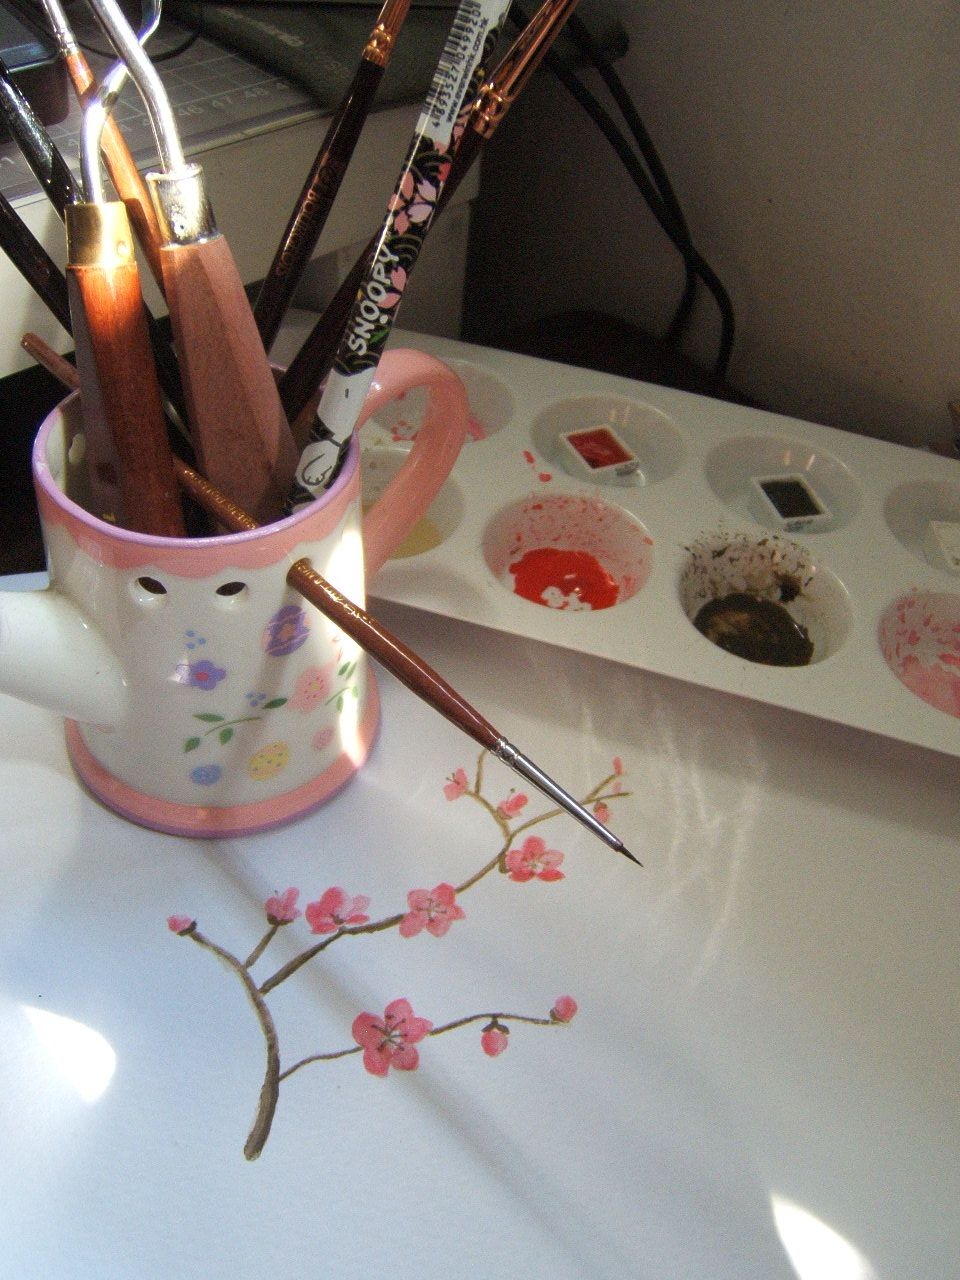 sakura painting @sakura @watercolor @invitation